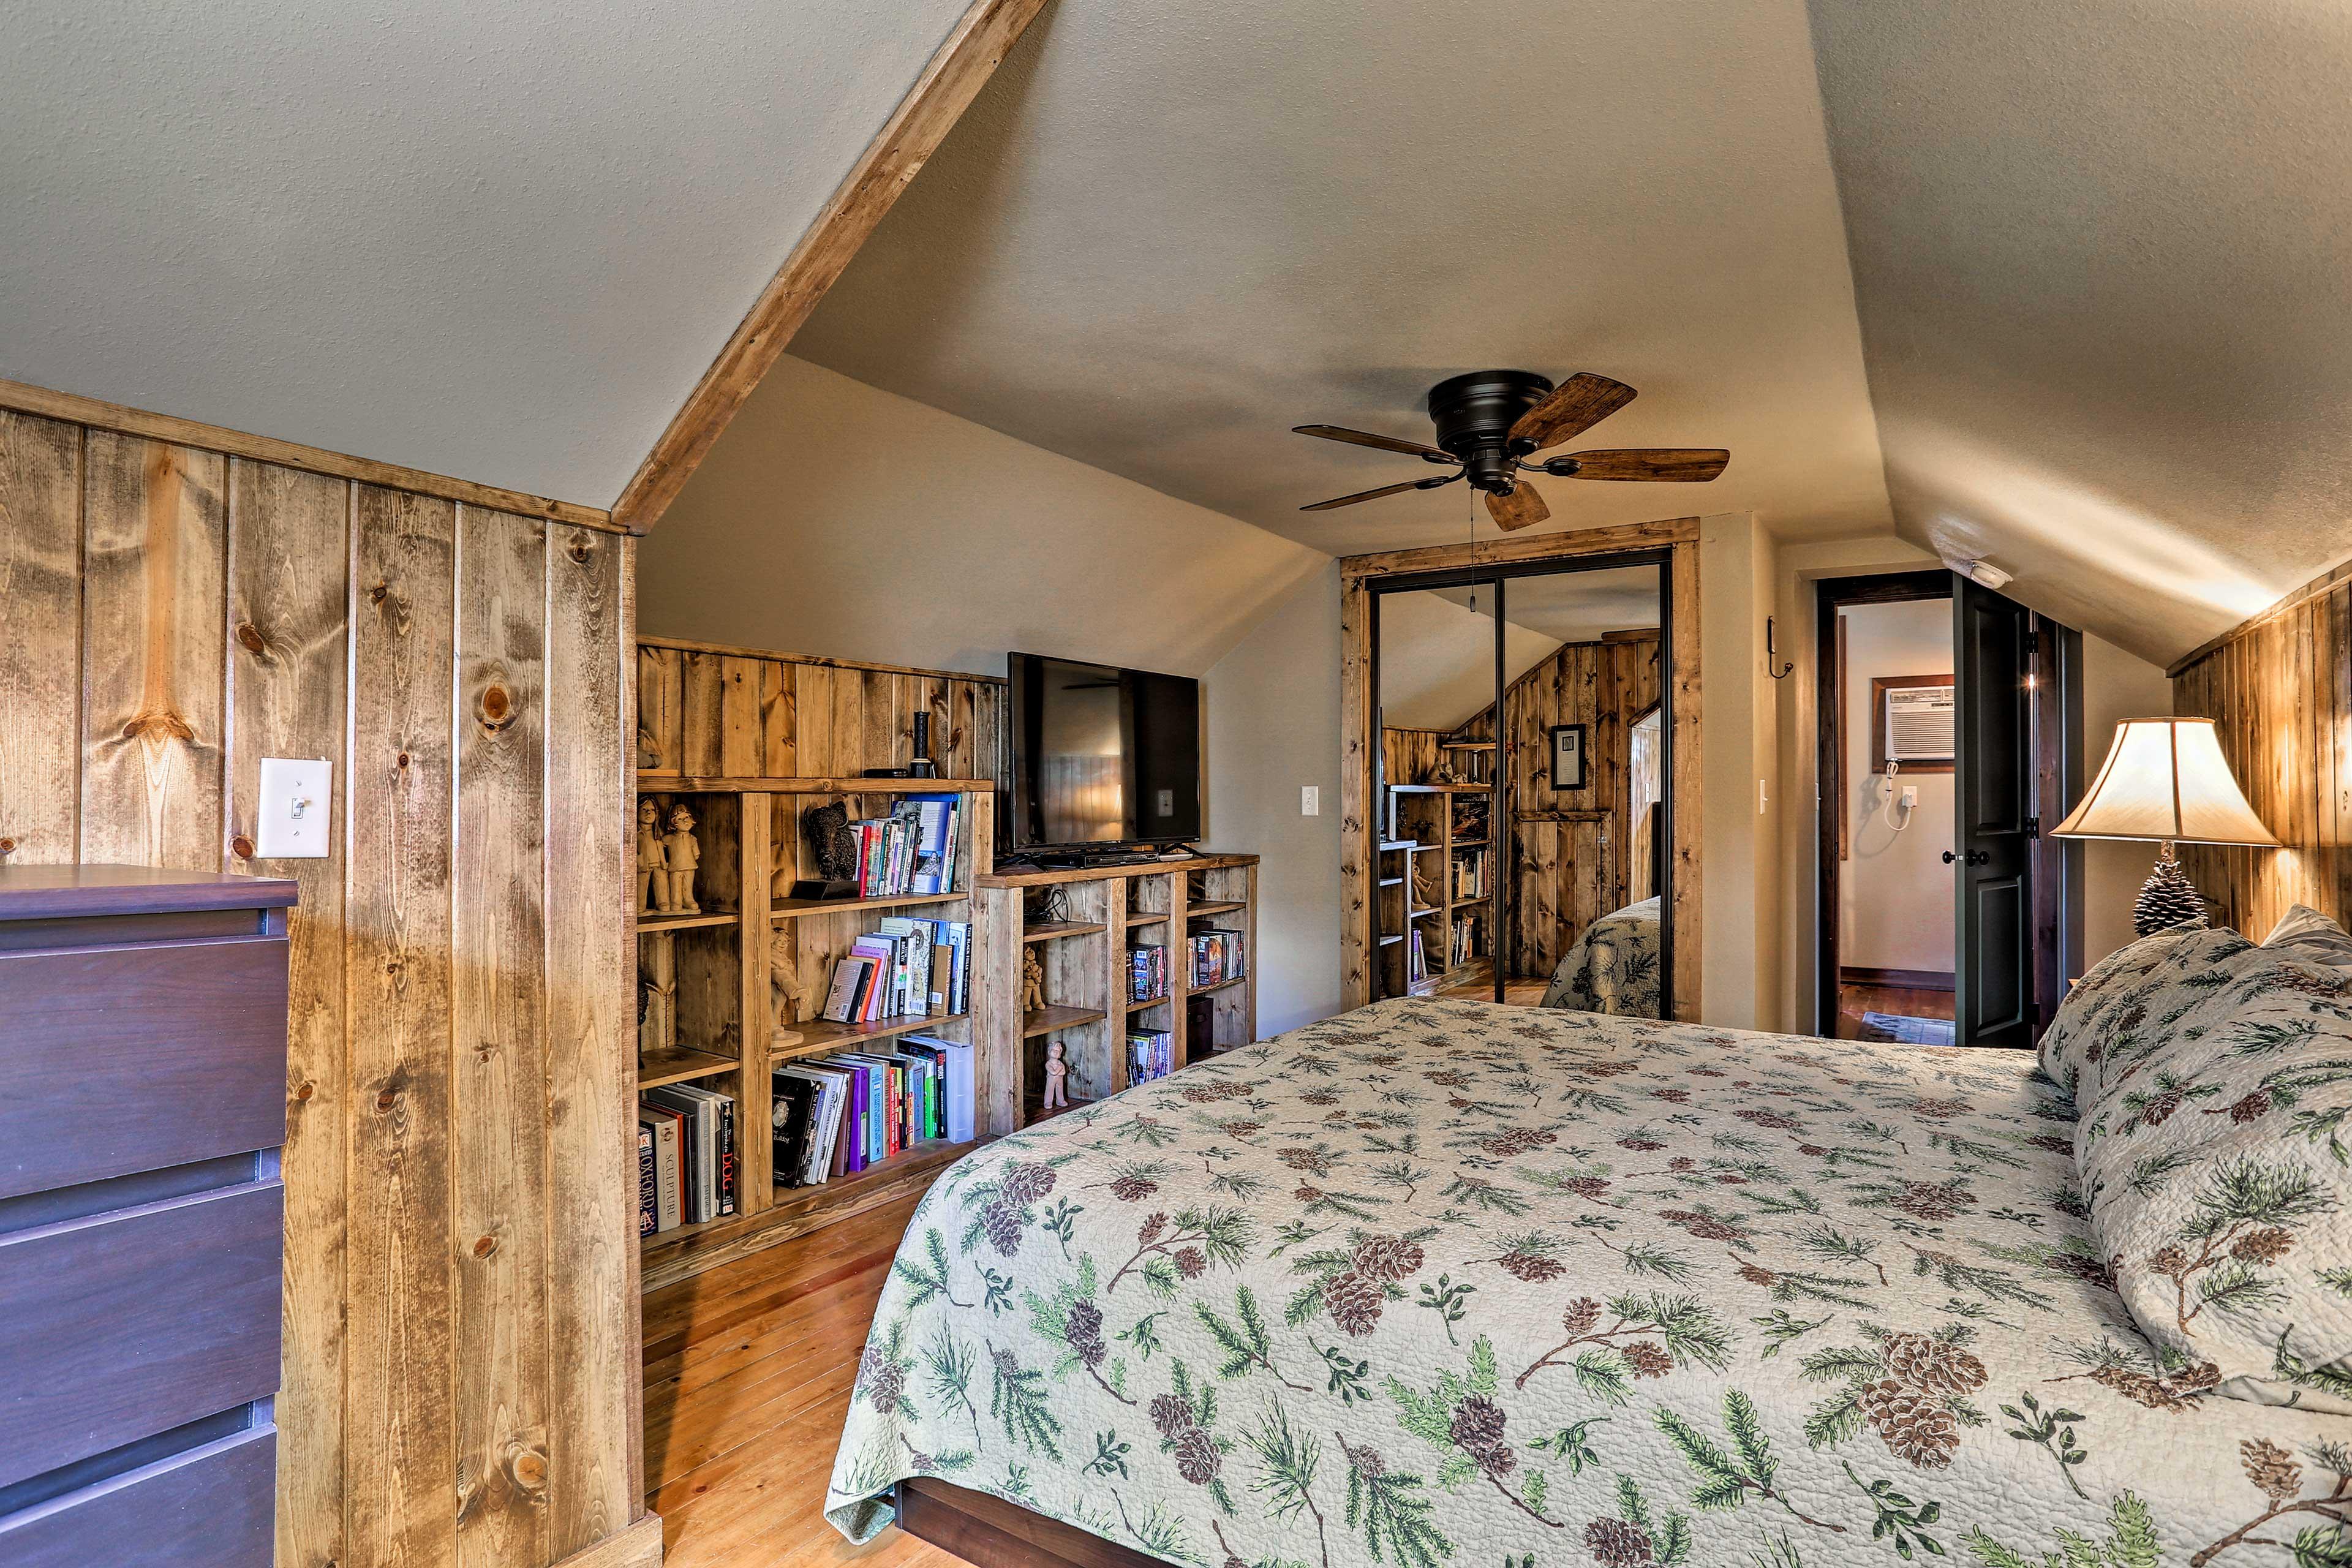 Choose a book off the shelf to help you fall asleep!